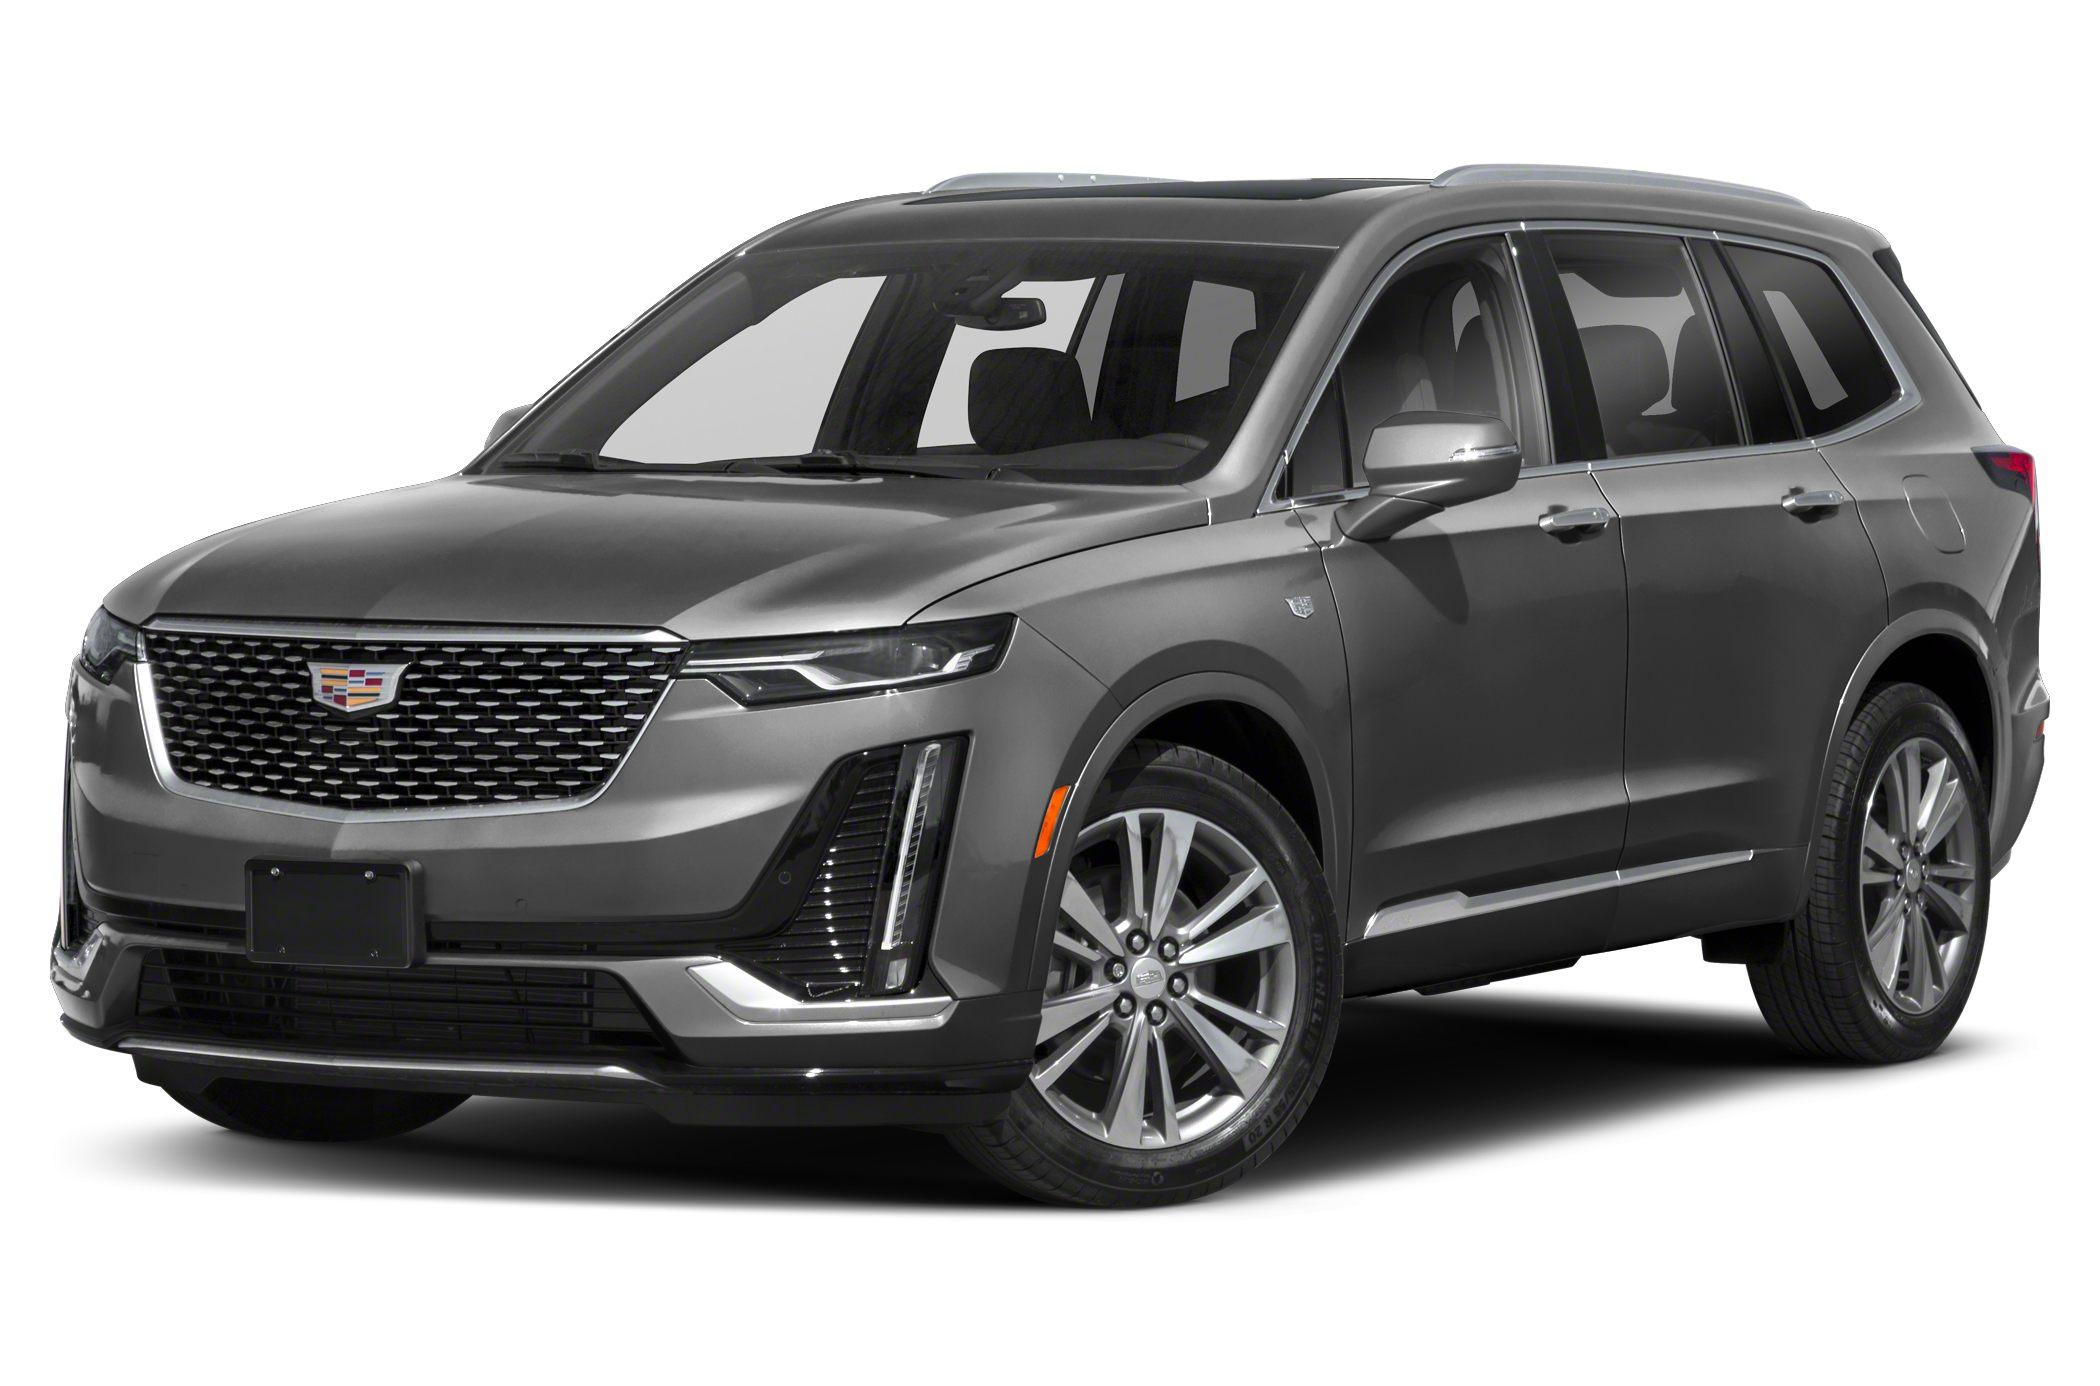 2020 Cadillac Xt6 Reviews Specs Photos